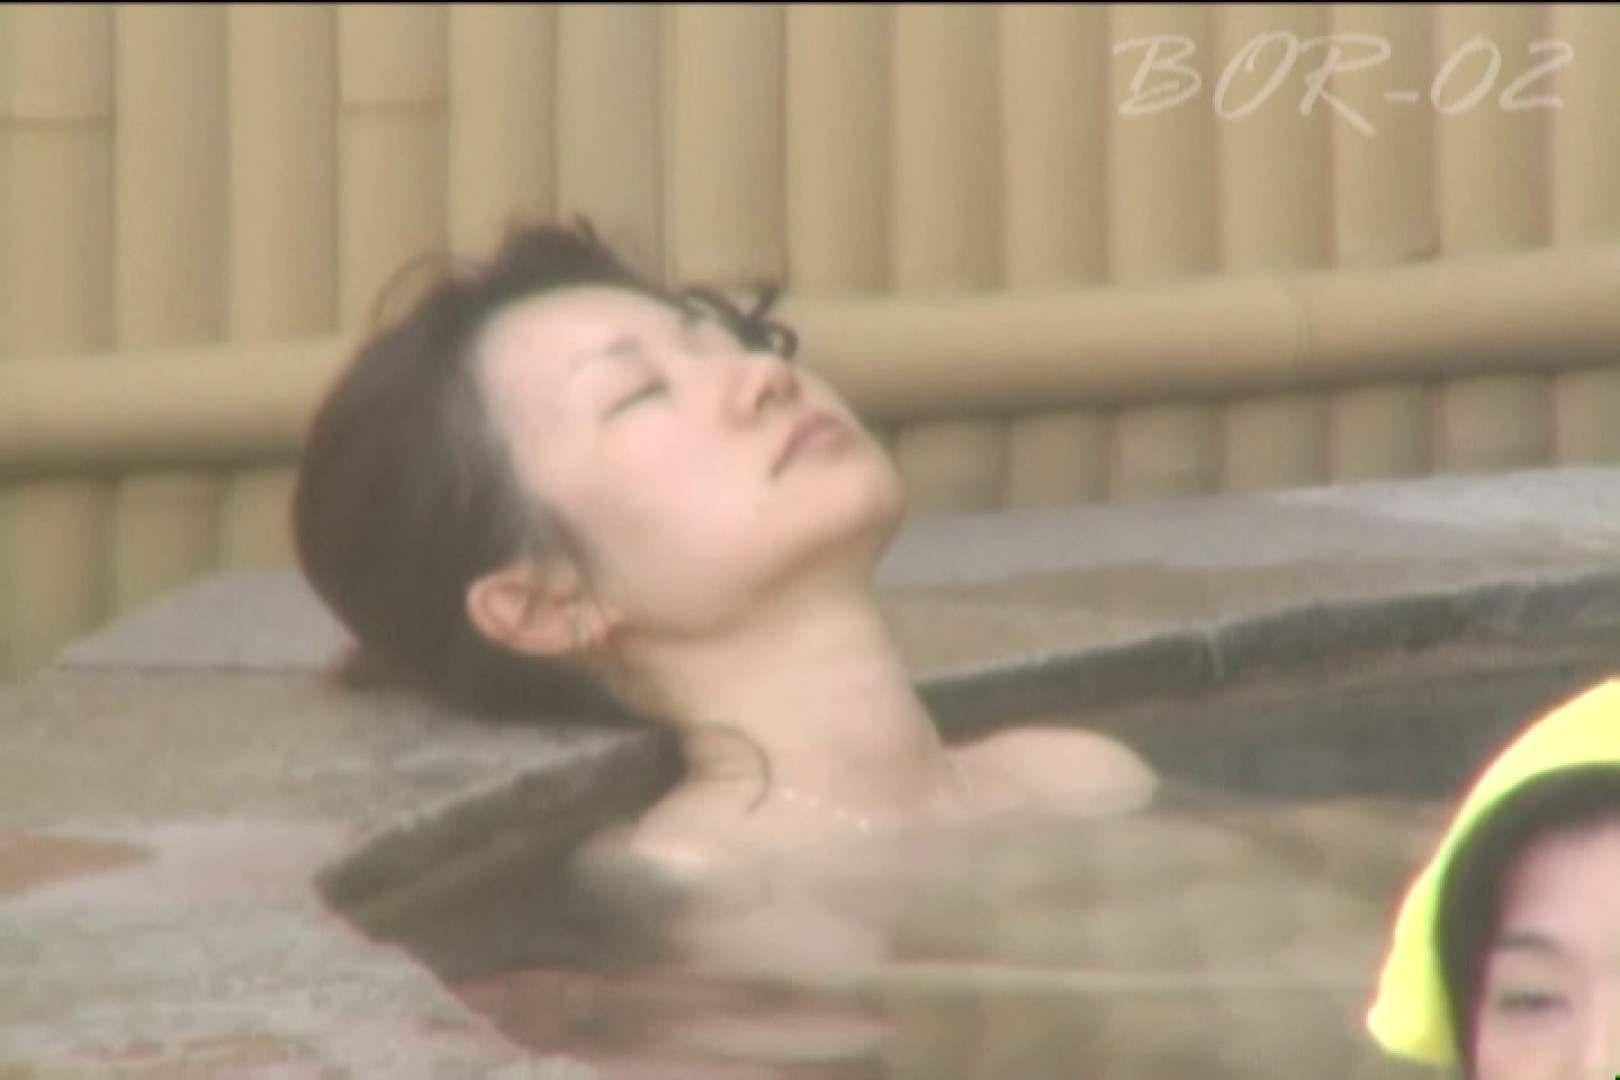 Aquaな露天風呂Vol.477 OLセックス 盗撮われめAV動画紹介 86画像 35